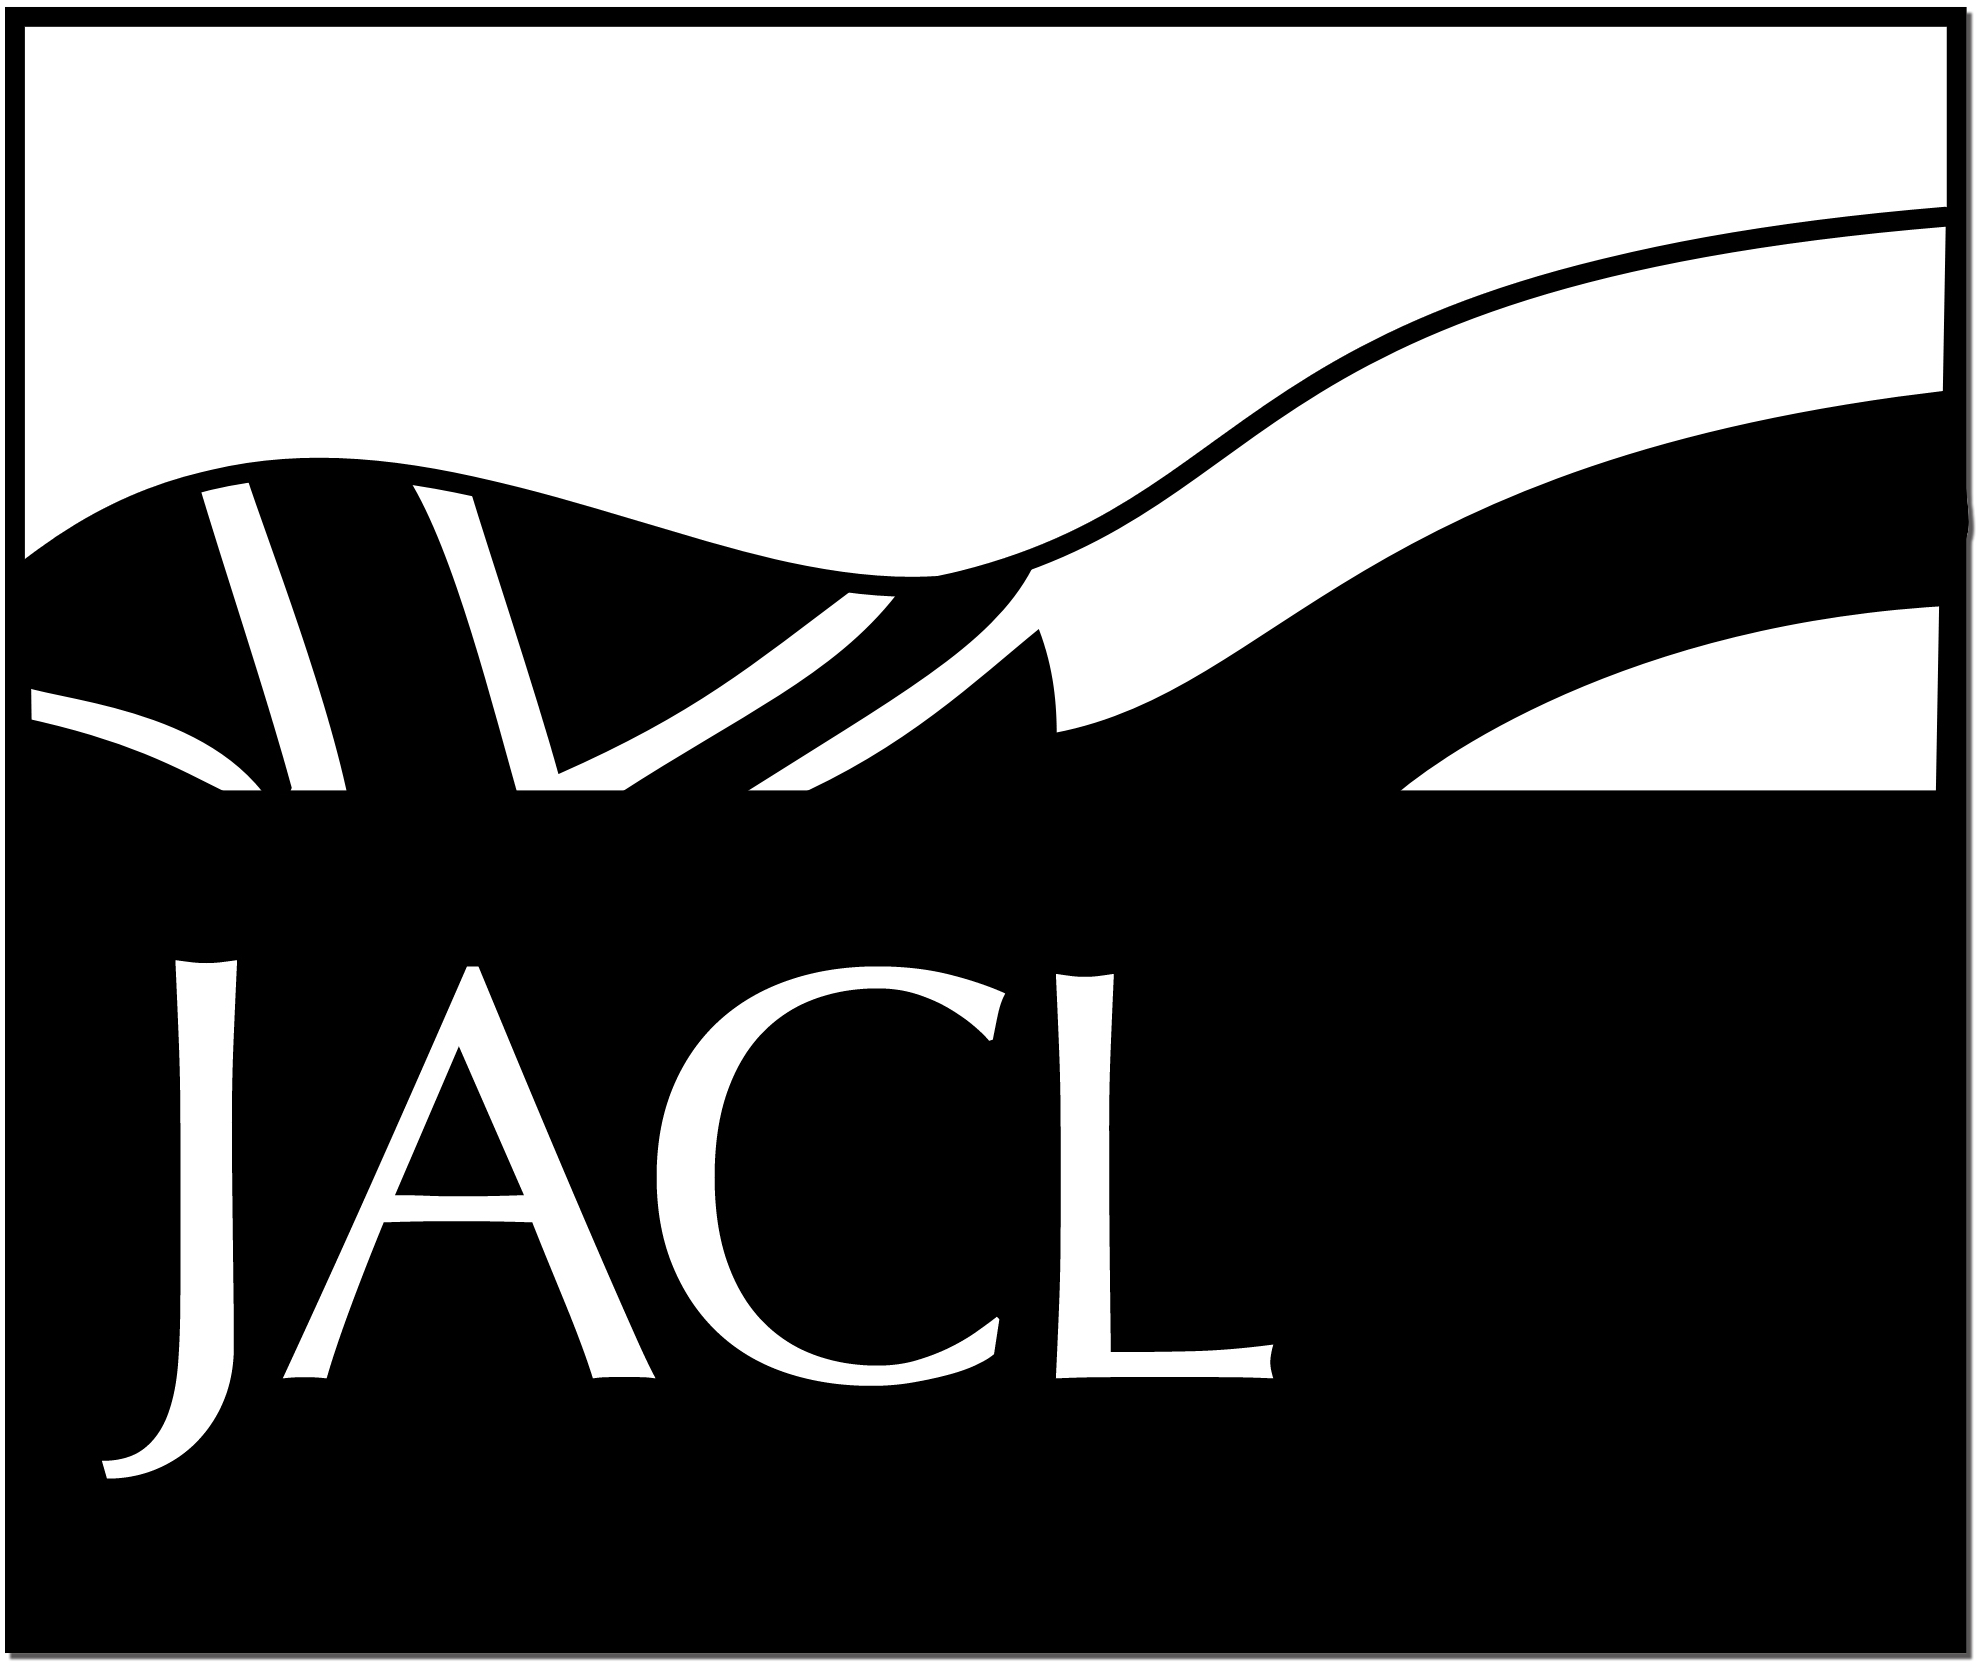 JACL logo.jpg